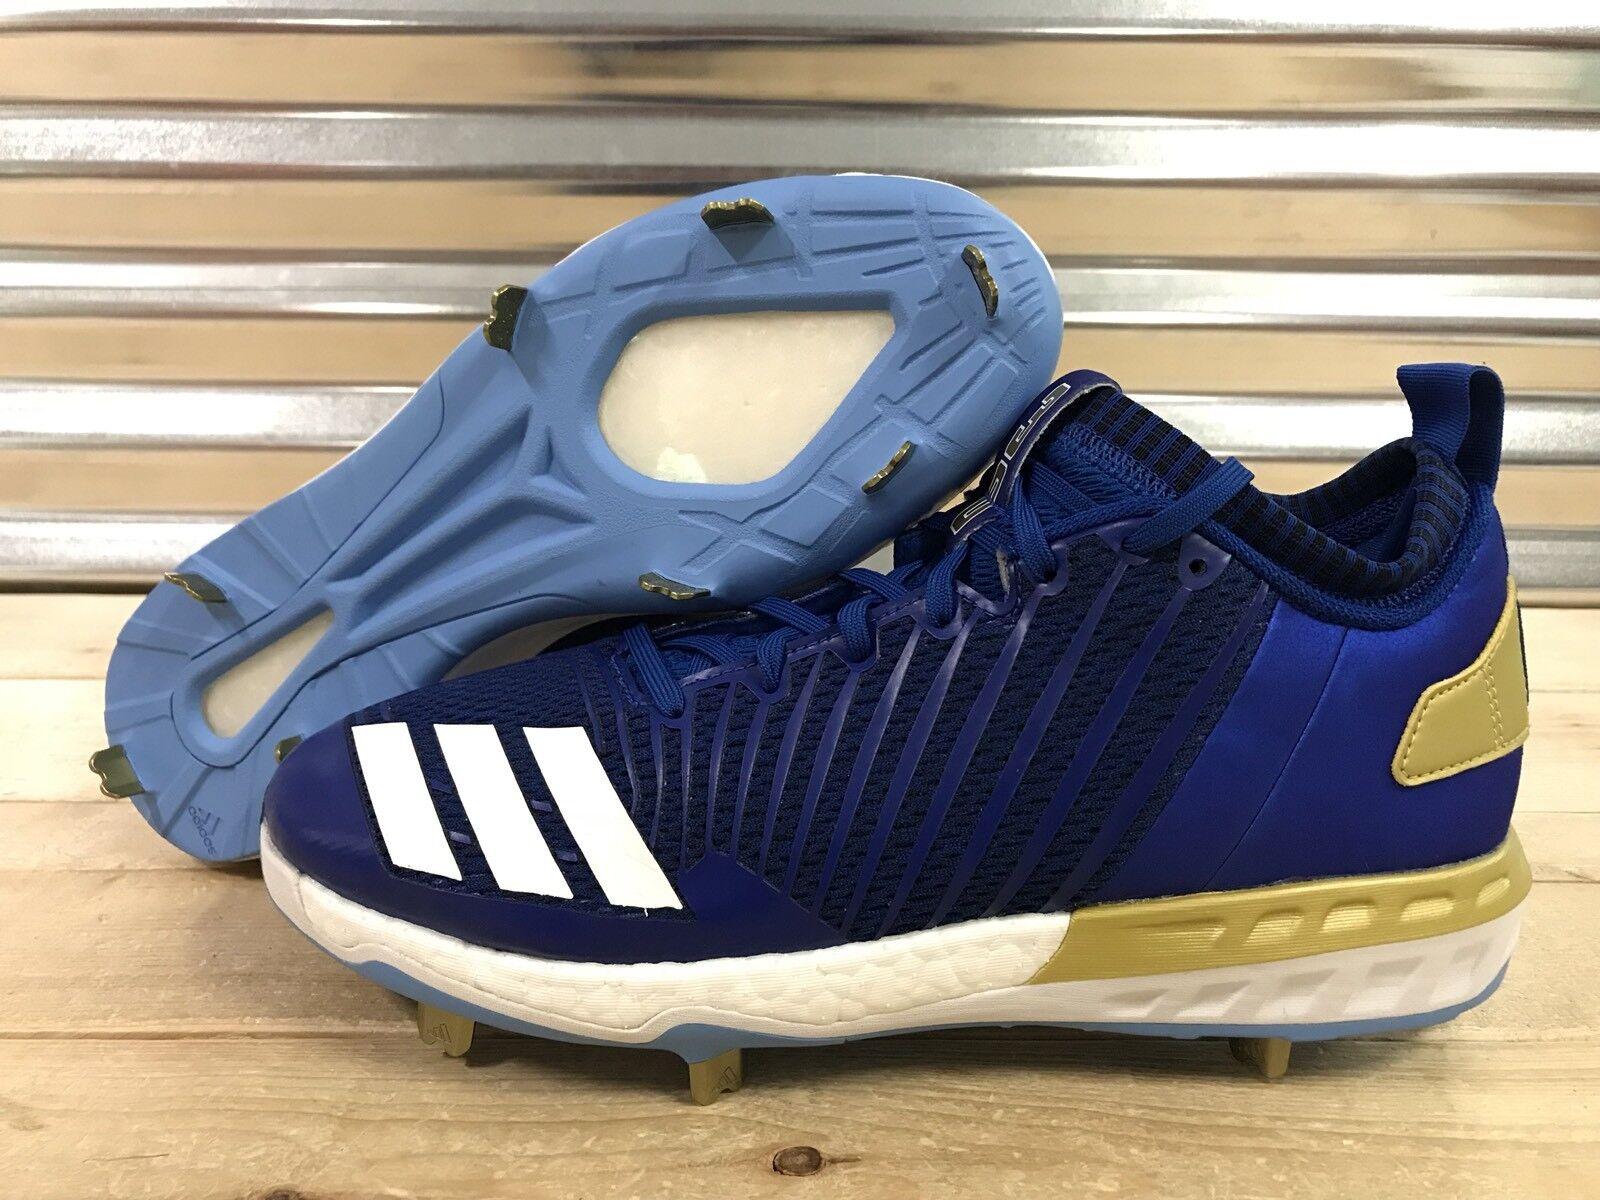 Adidas Boost icono 3 Yordano Ventura 30 PE Dorado de béisbol color Realeza Dorado PE (CG5499) c0ba7a